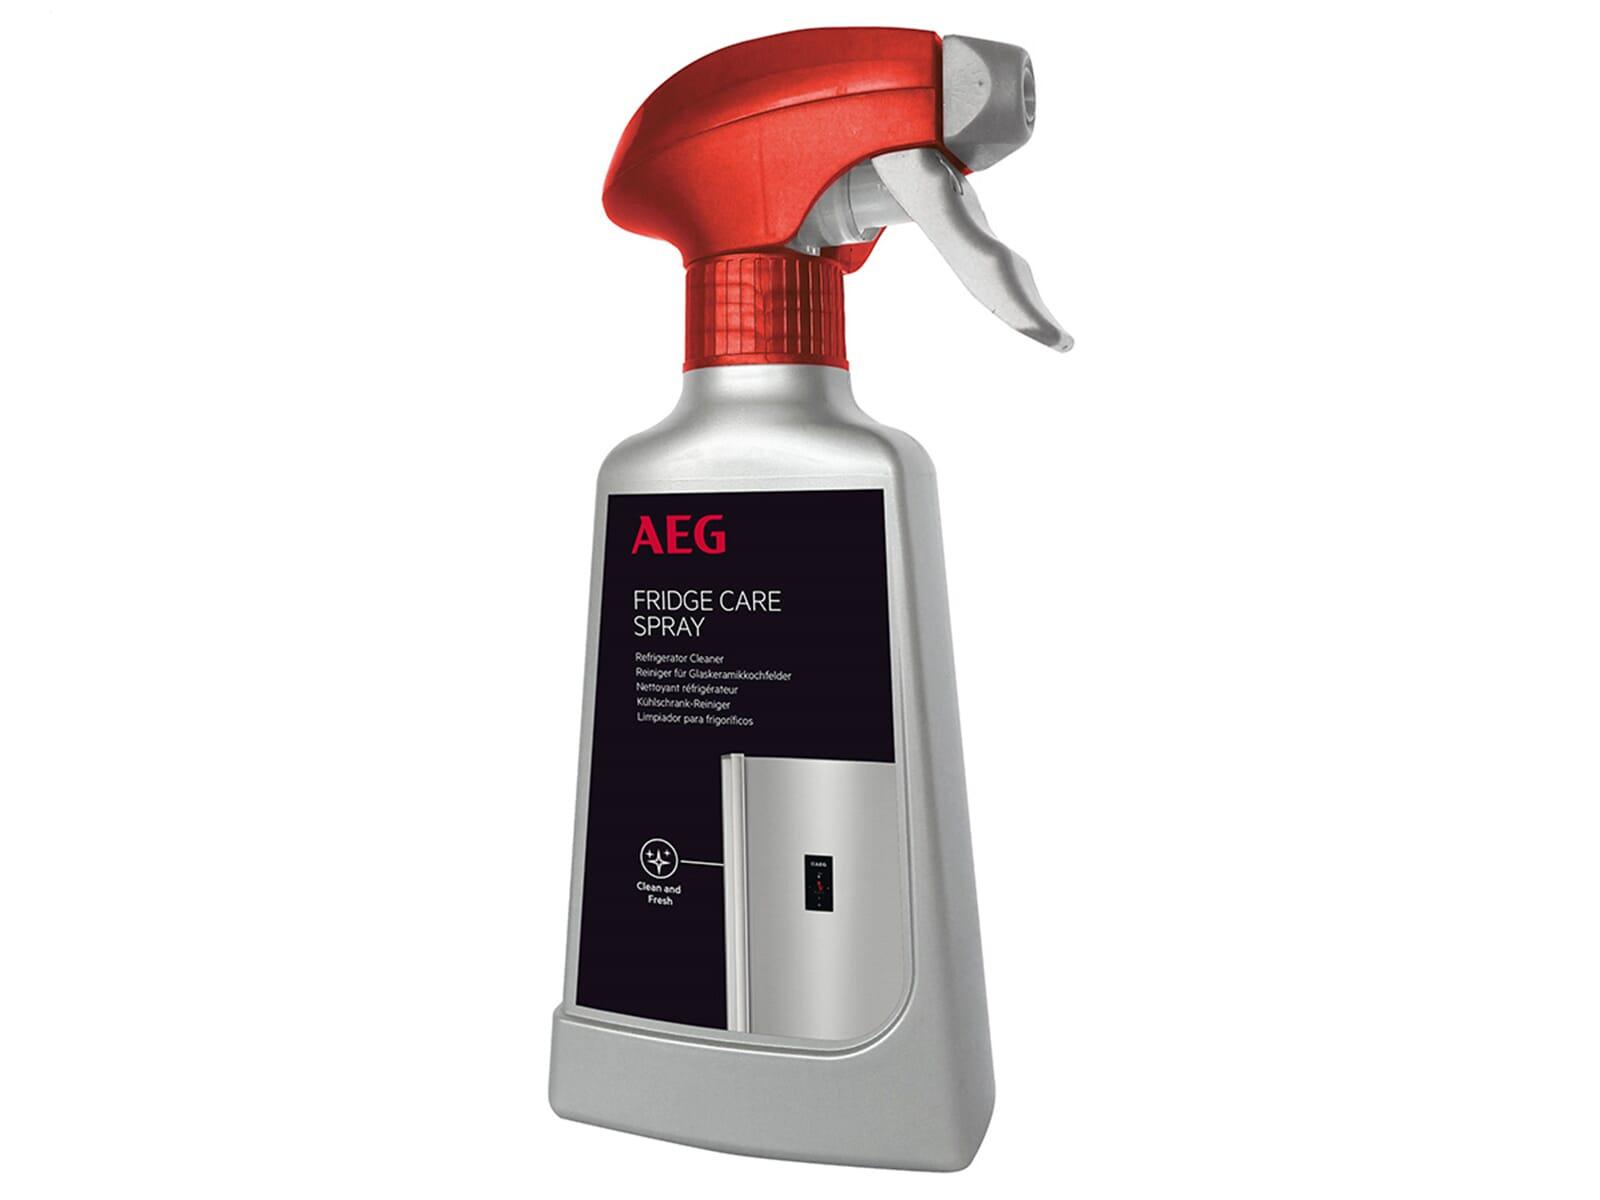 Kühlschrank Reiniger : Kühlschrank reiniger kraftreiniger edelstahlpflege jemako premium